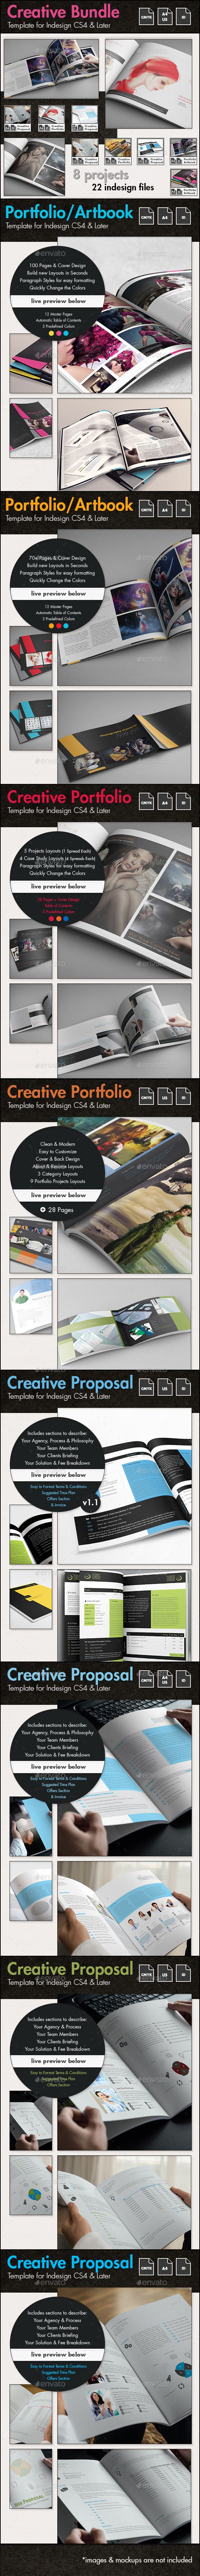 Portfolio and Proposal Bundle